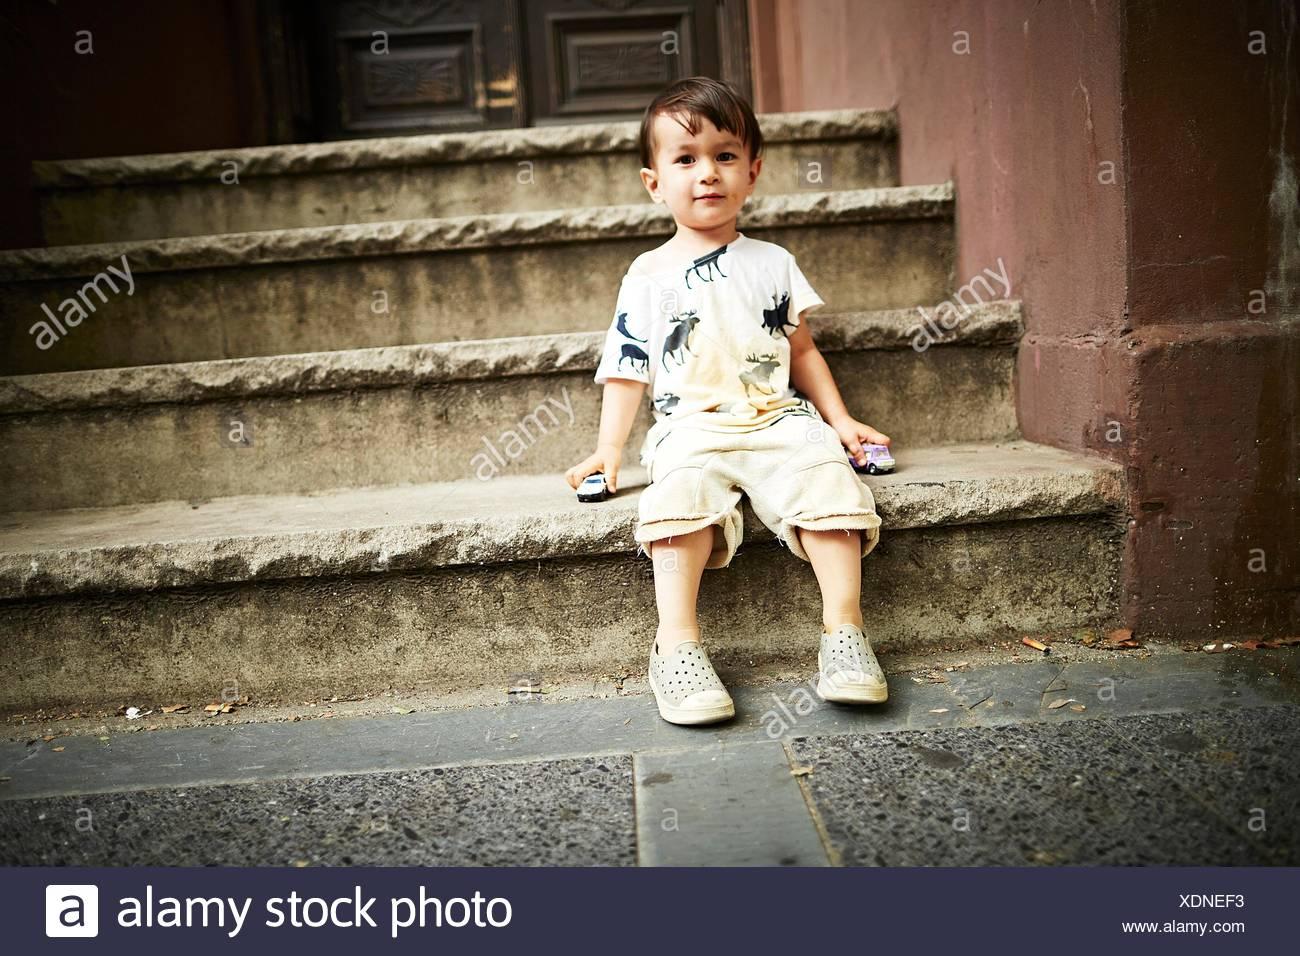 Boy sitting on steps - Stock Image